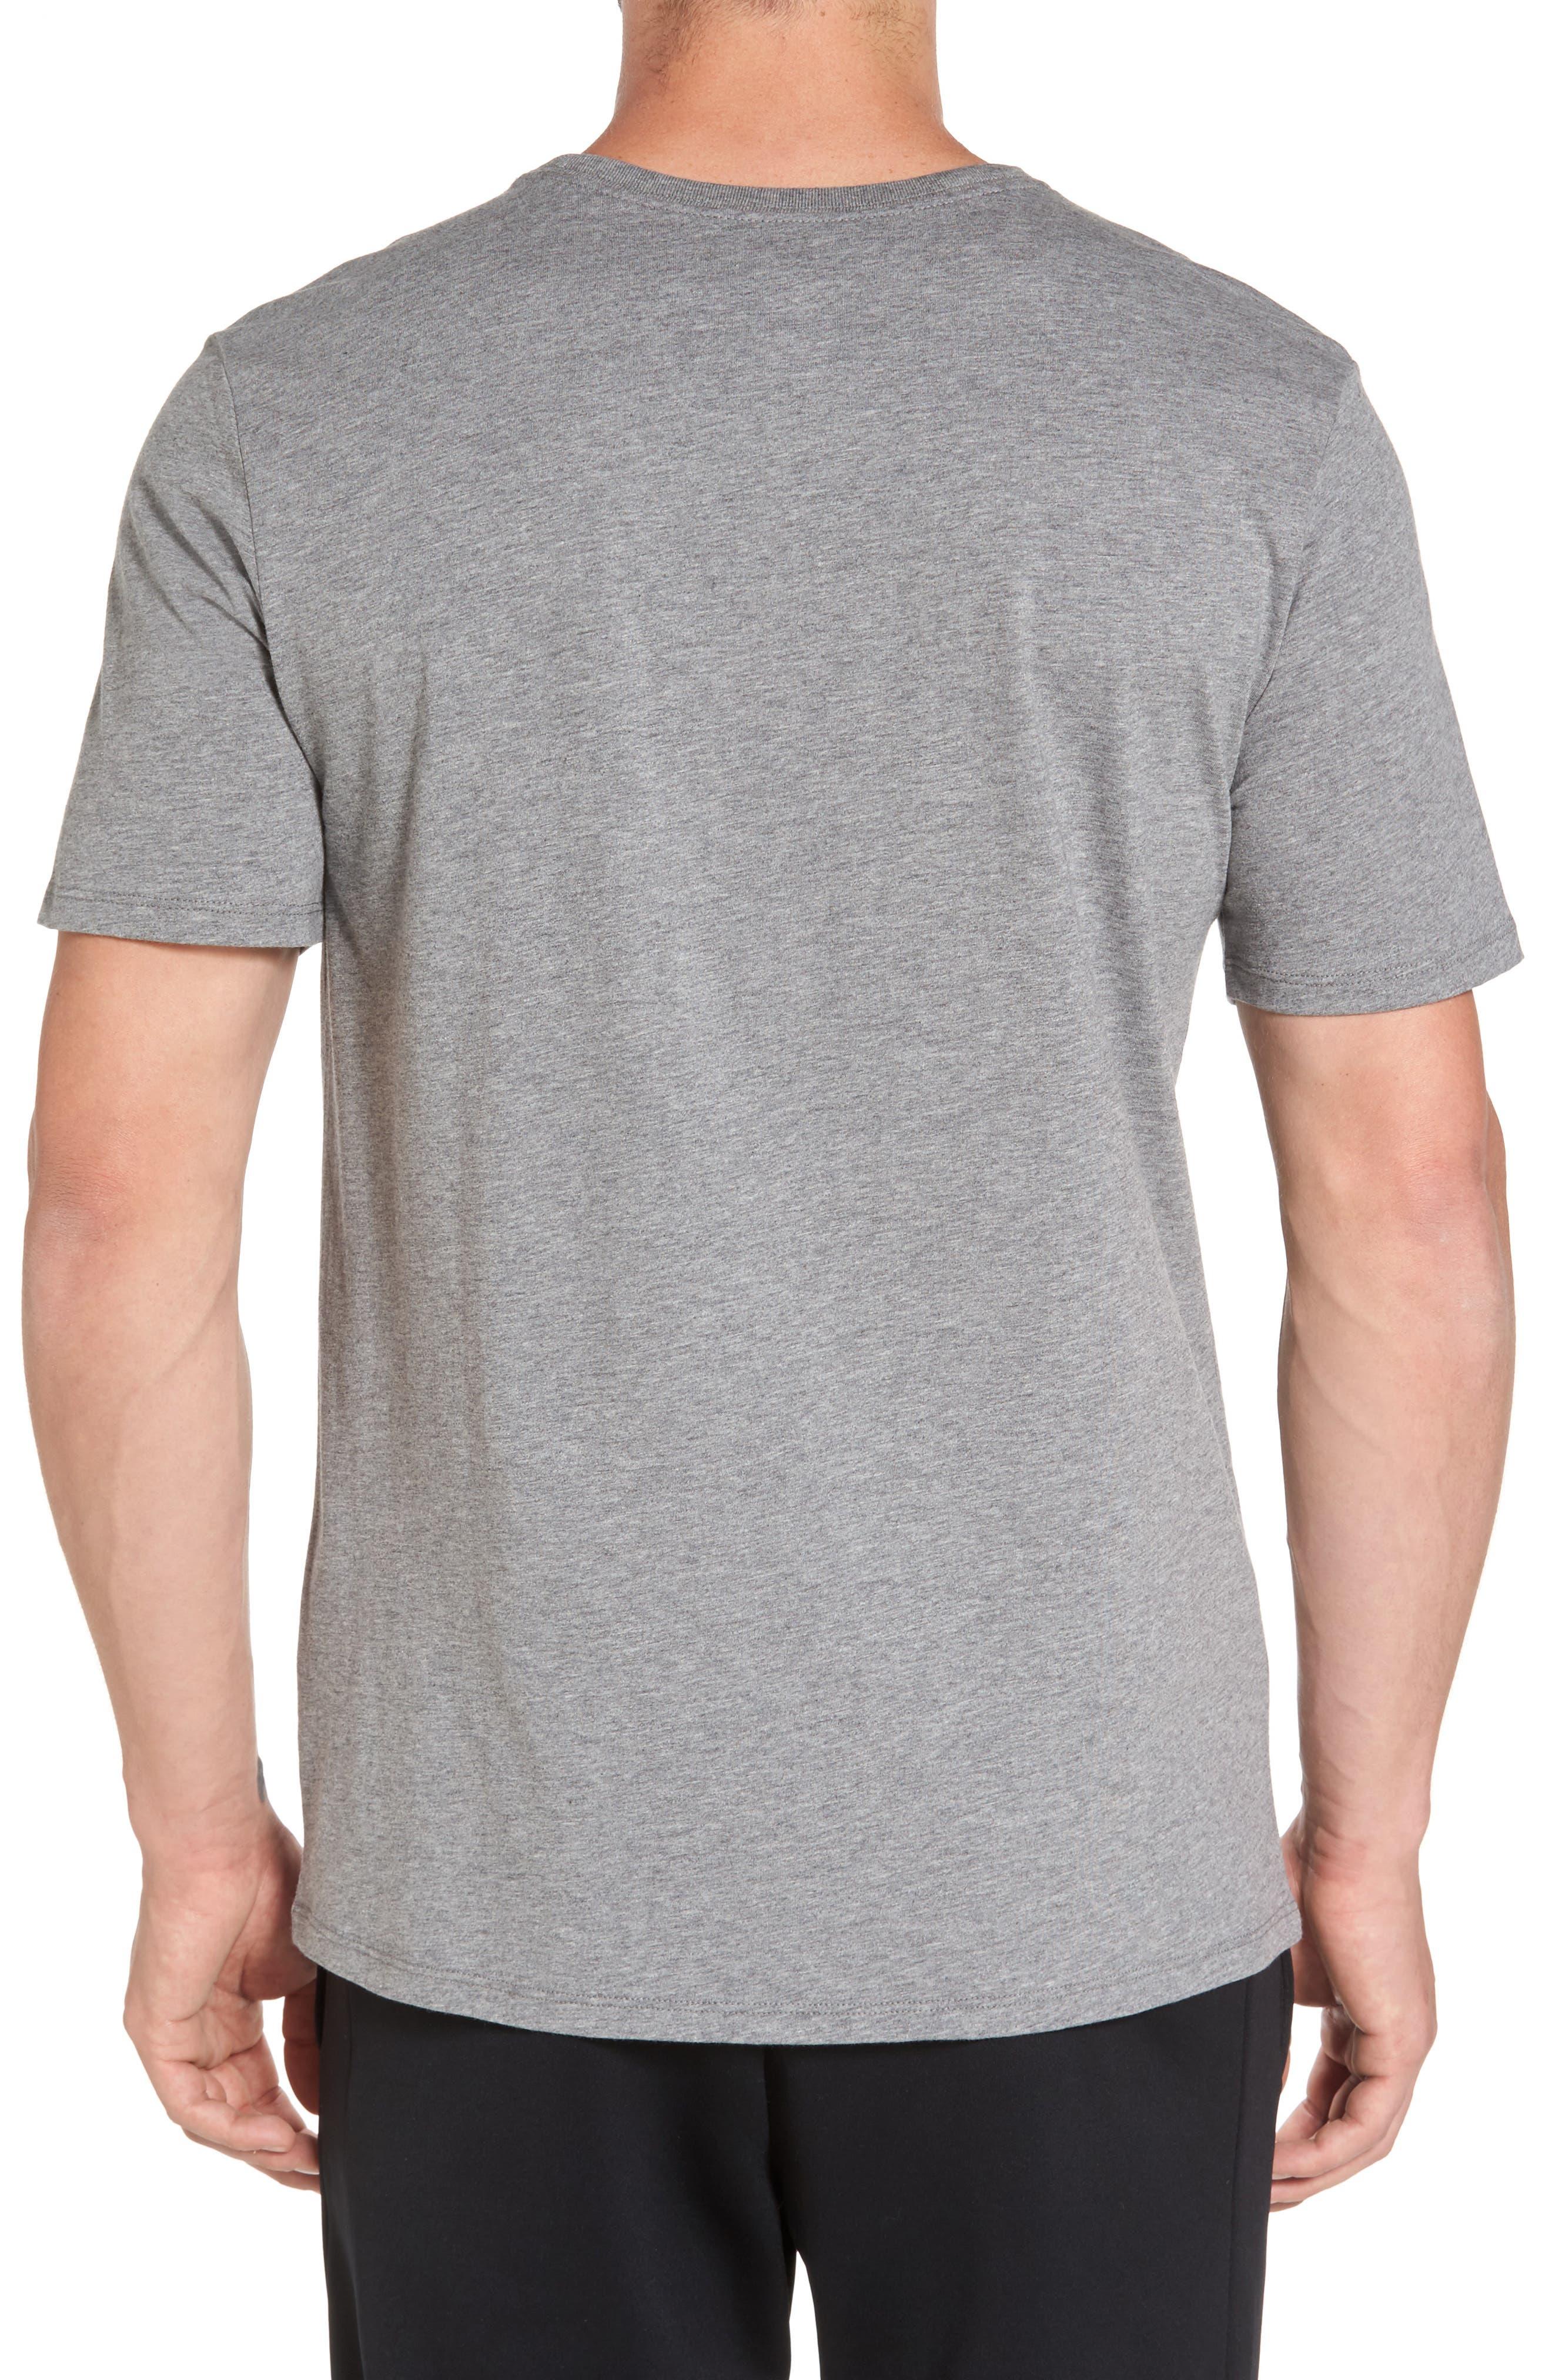 Sportswear AJ11 CNXN Graphic T-Shirt,                             Alternate thumbnail 4, color,